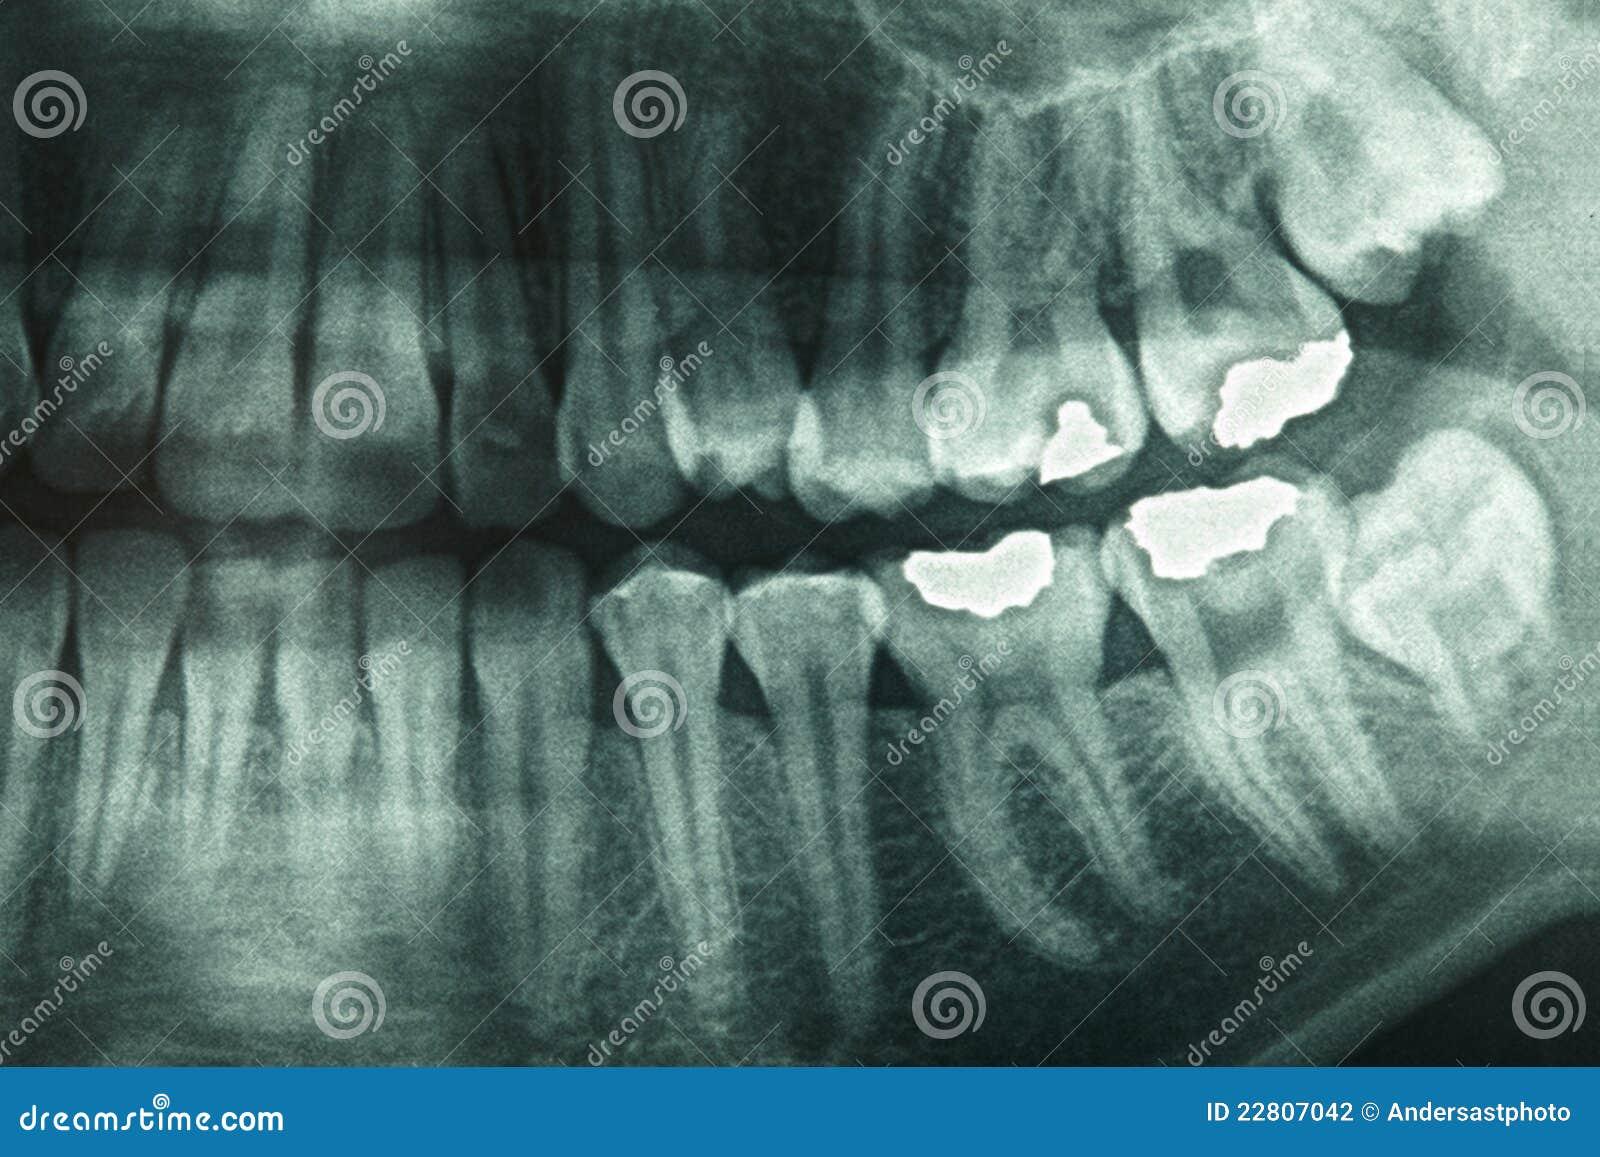 Dental Xray Stock Photography Image 22807042